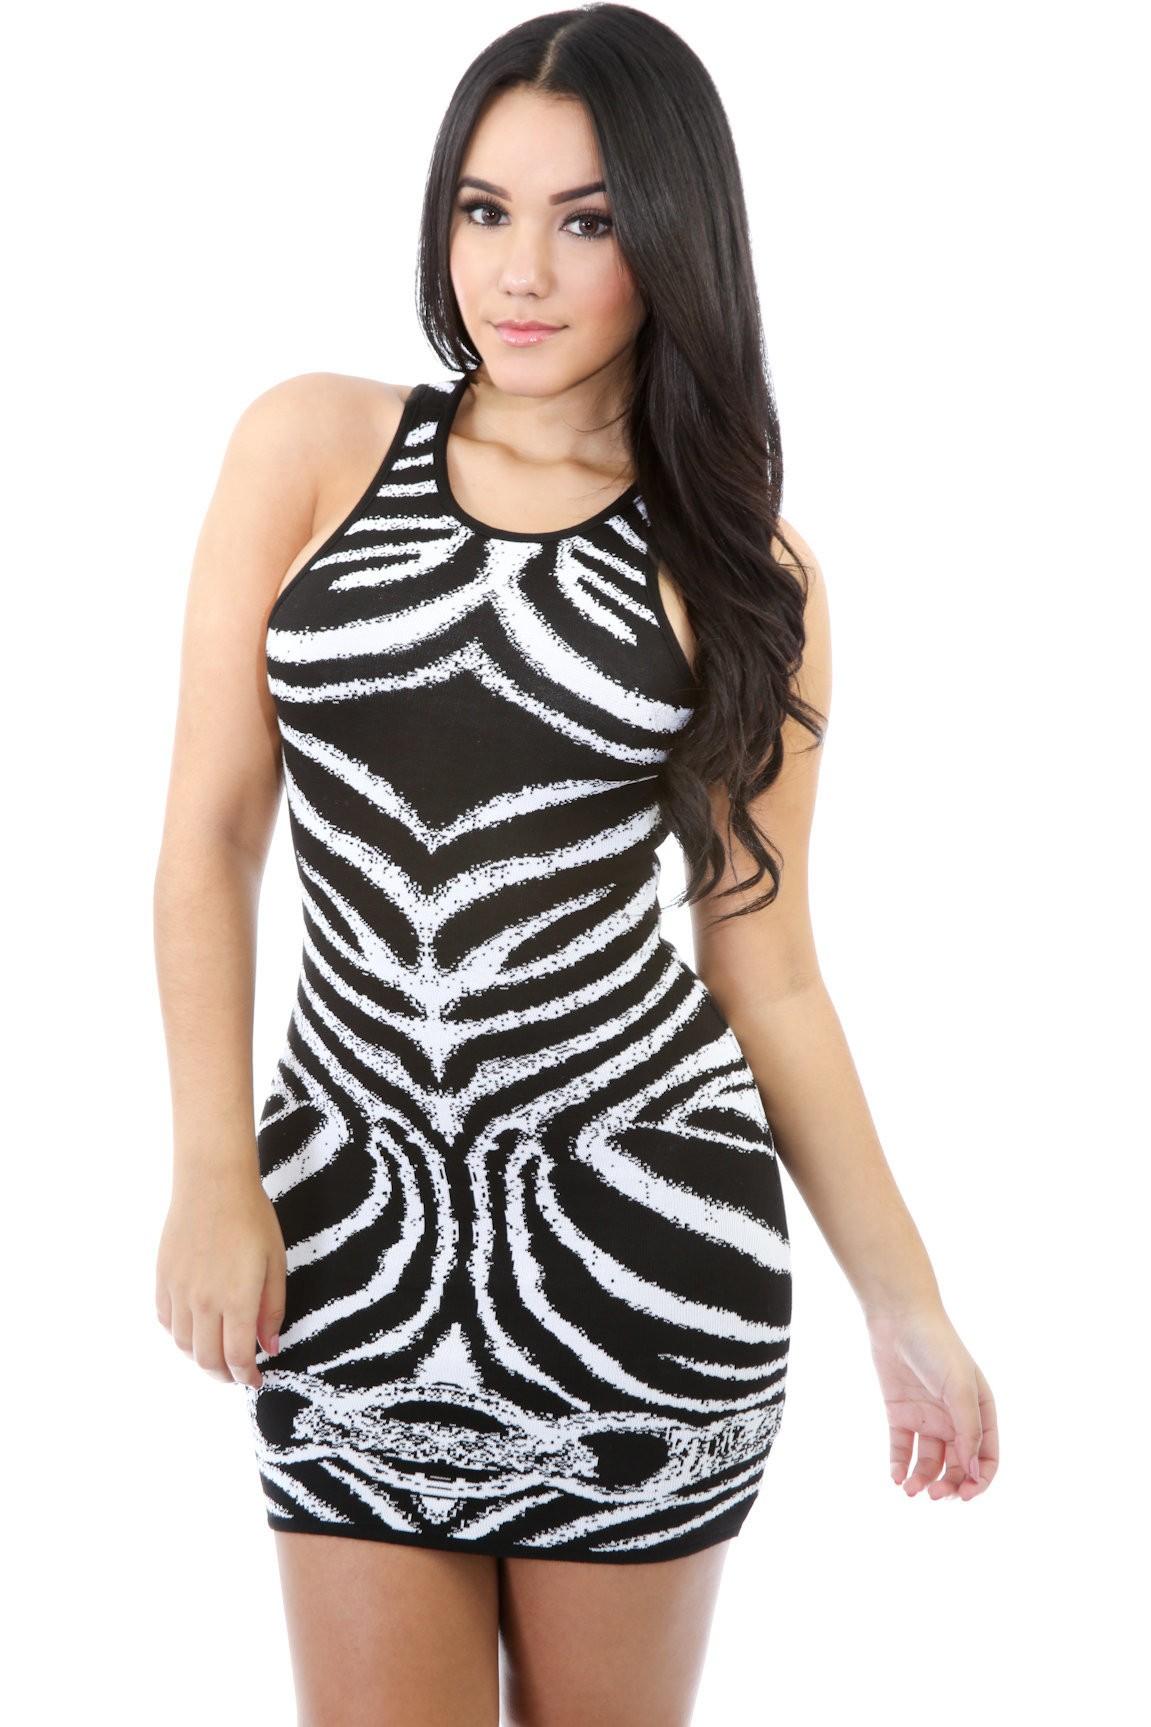 Romantic Curves Lined Dress